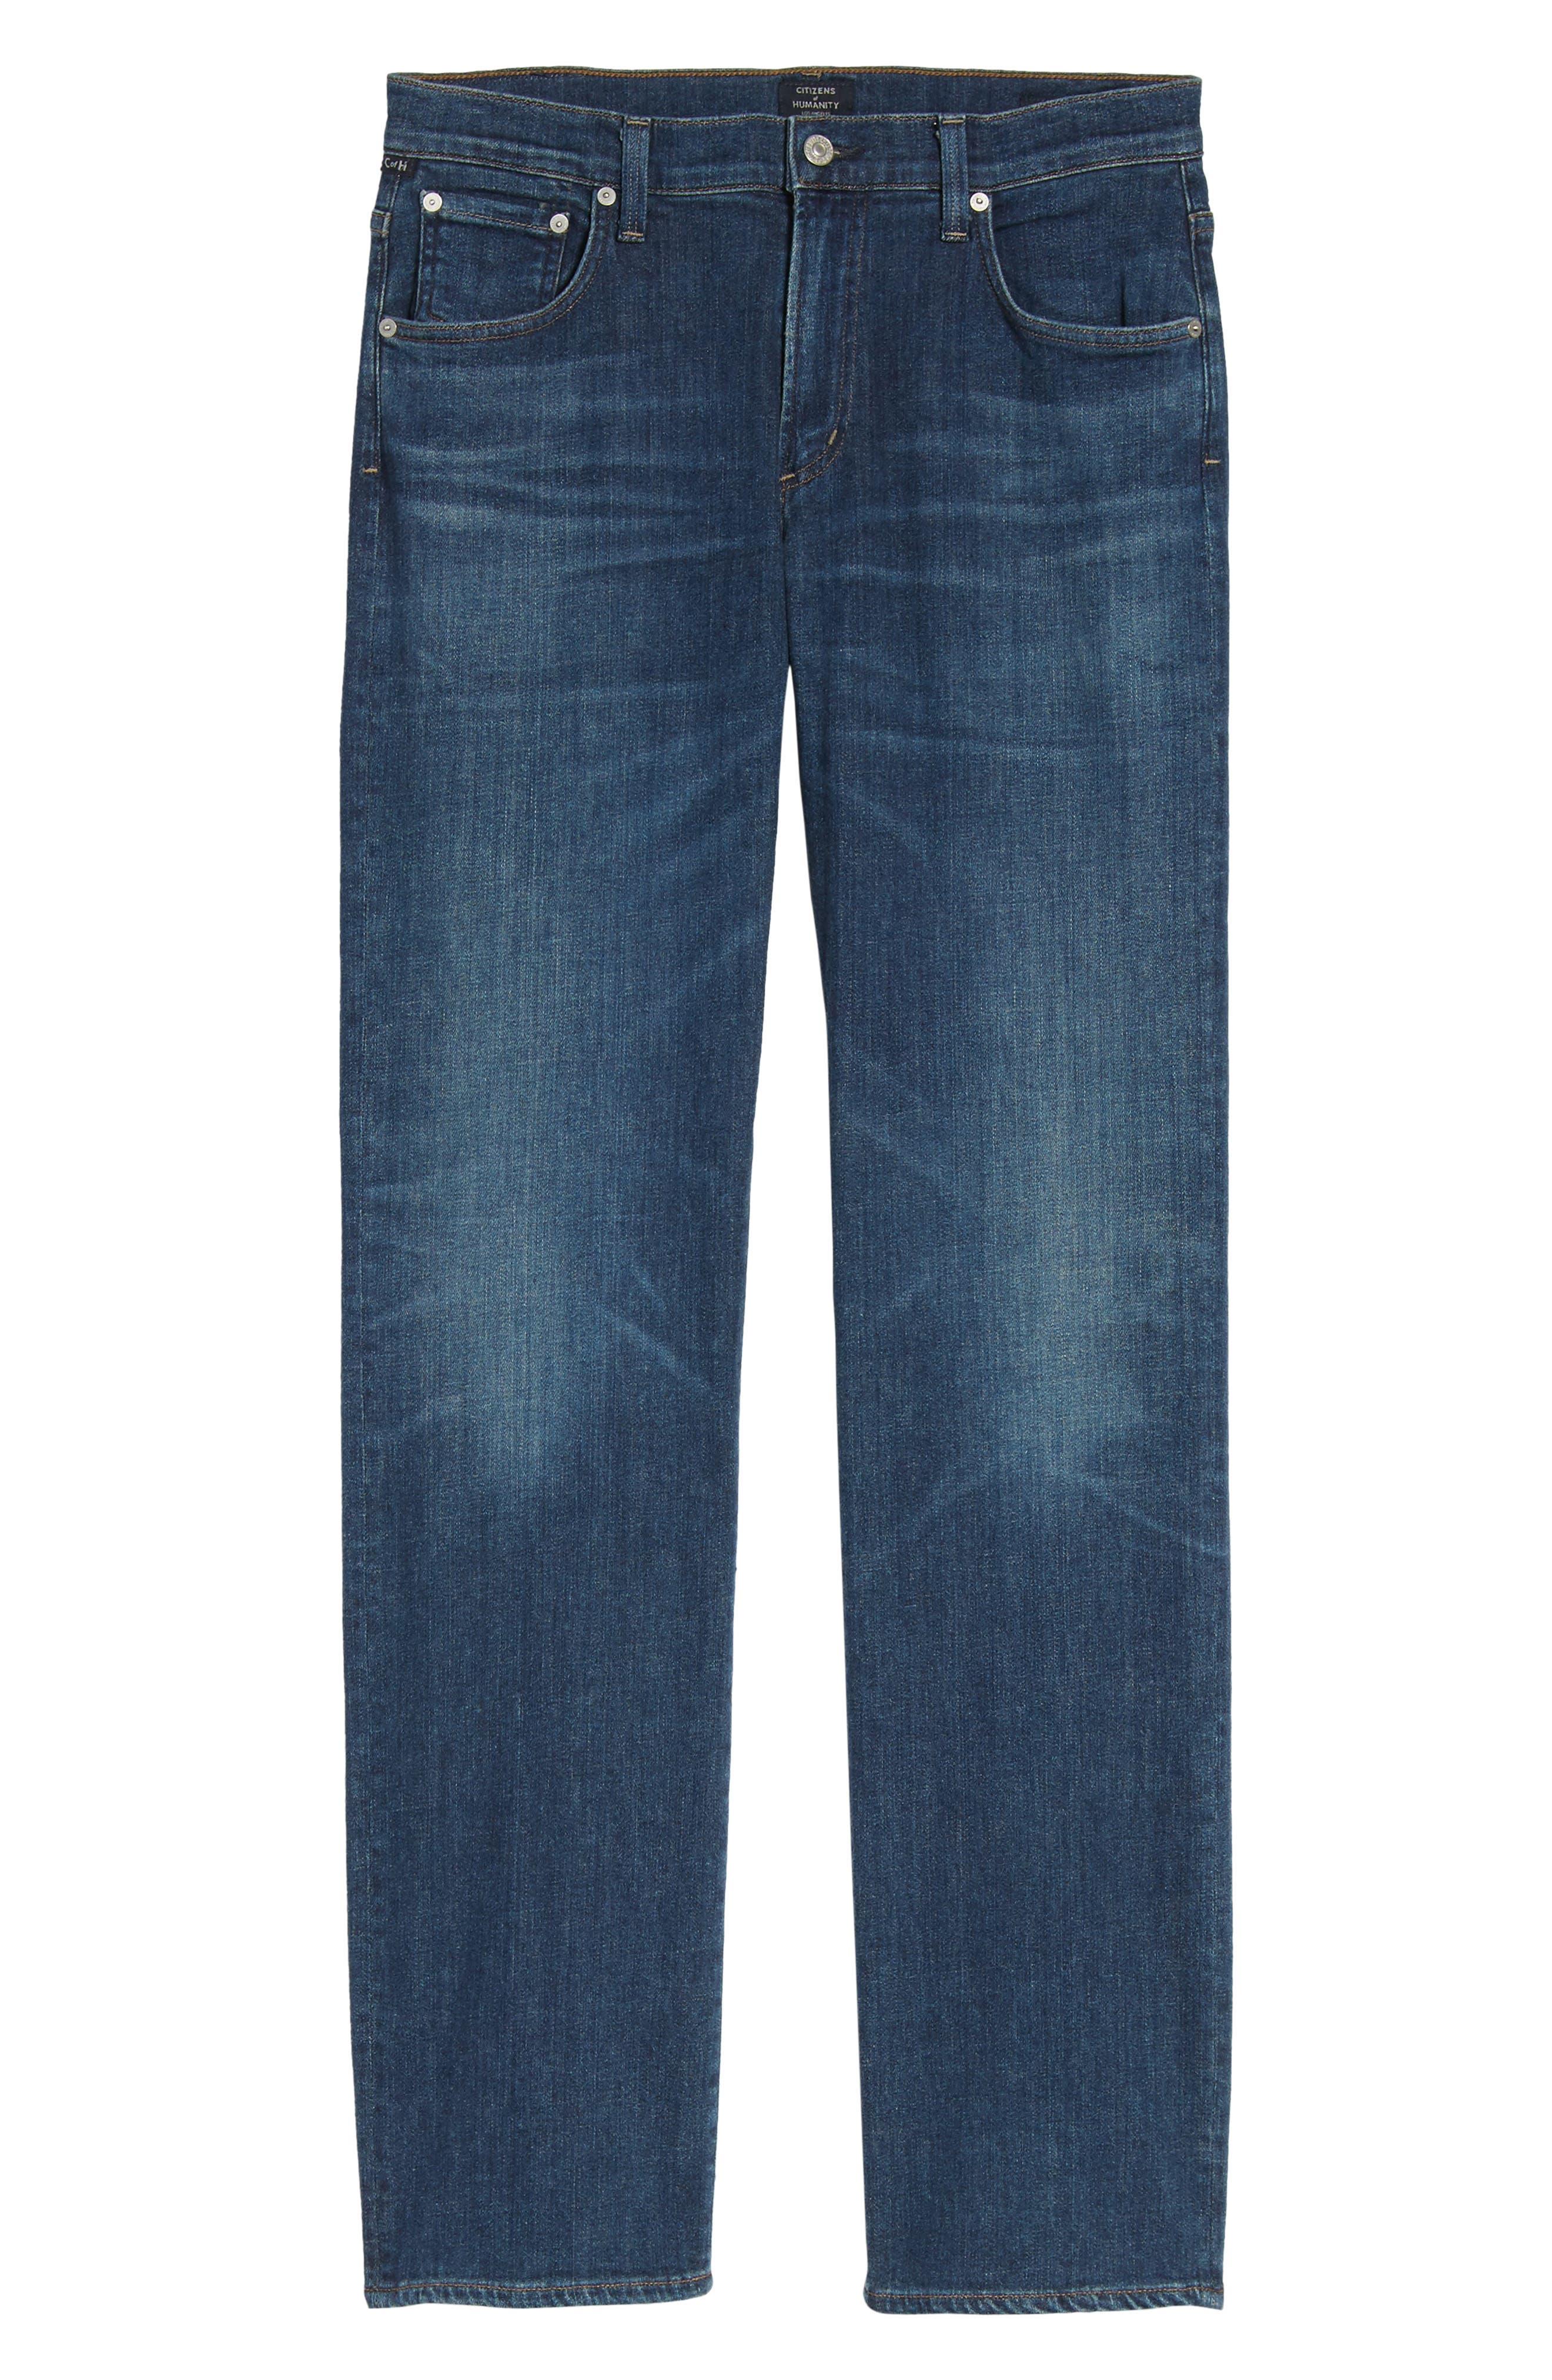 Sid Straight Leg Jeans,                             Alternate thumbnail 6, color,                             Eastgate